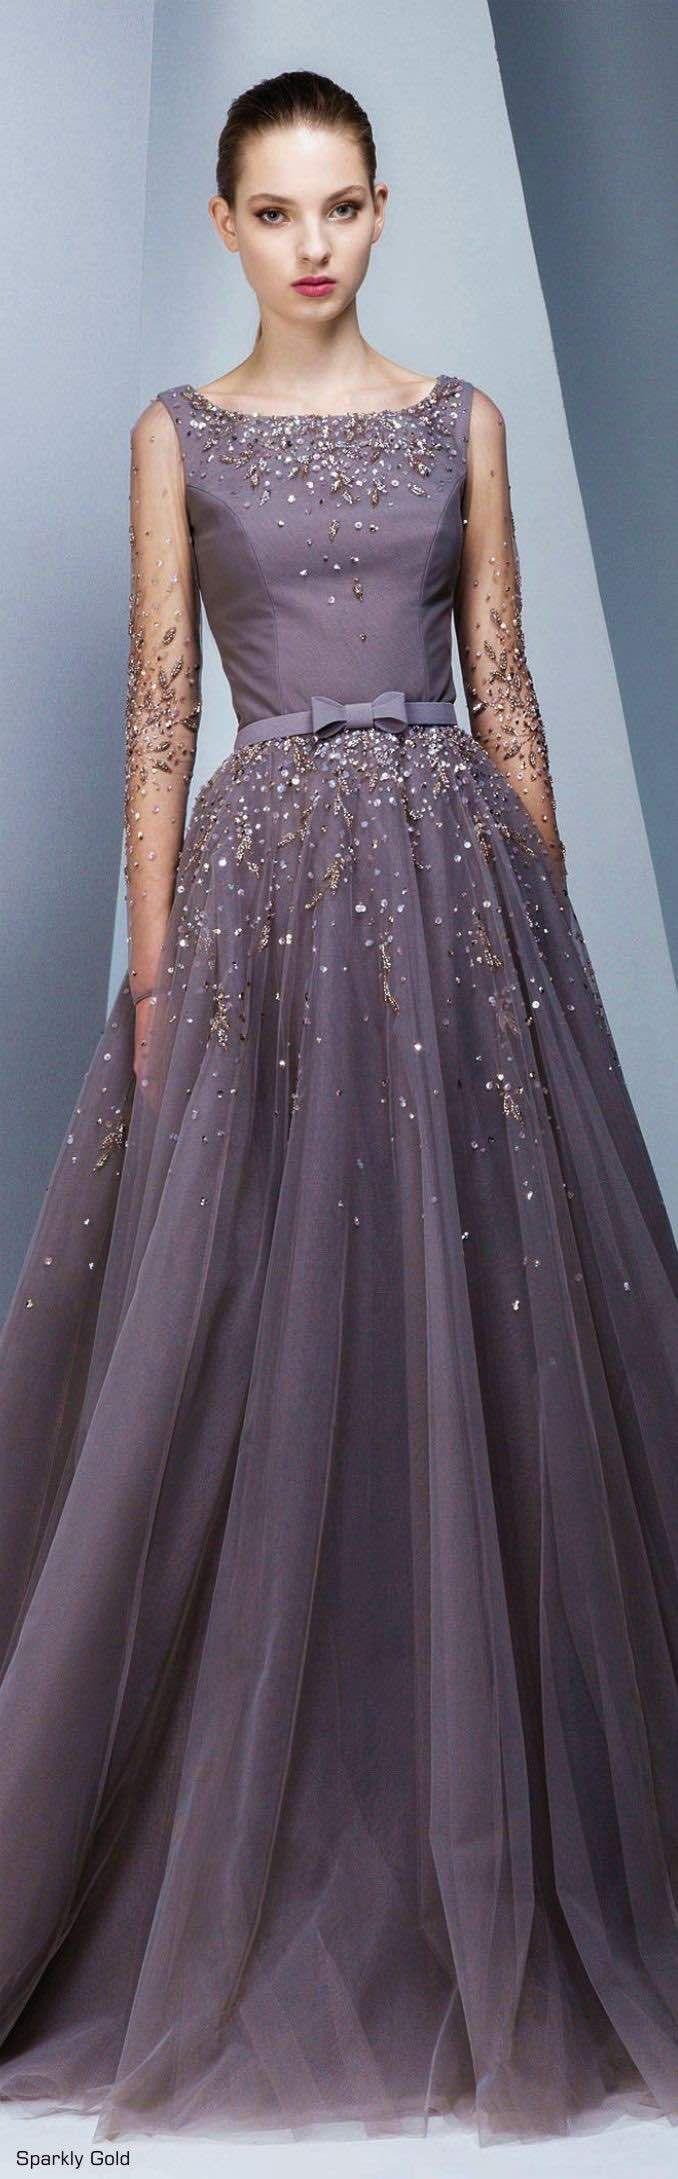 Purple Wedding Ideas with Pretty Details | Reina de hielo, Cosas de ...